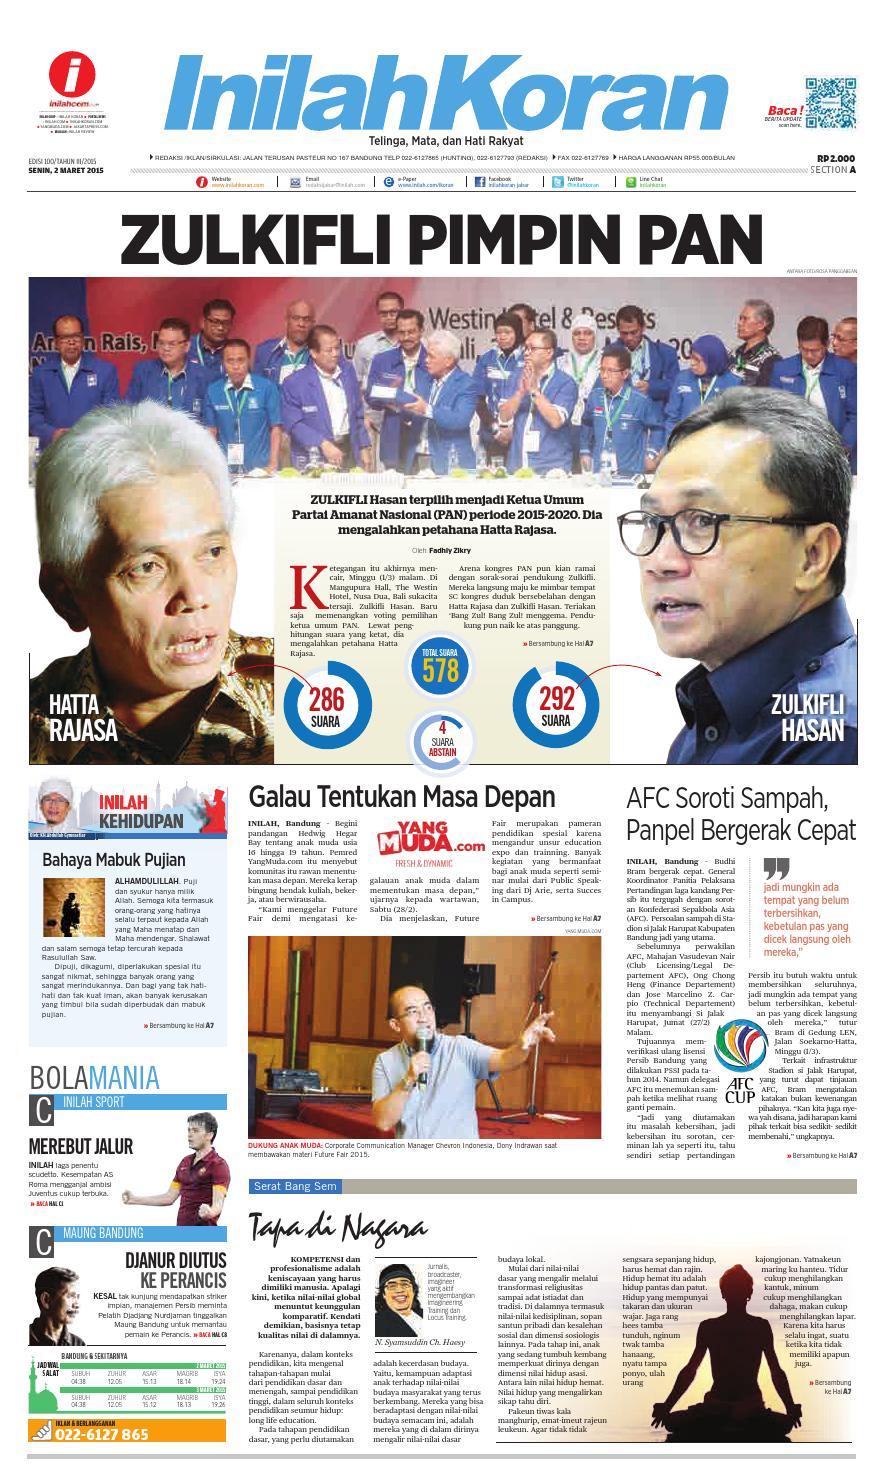 Zulkifli Pimpin Pan By Inilah Koran Issuu Tcash Vaganza 36 Produk Ukm Bumn Batik Print Motif3